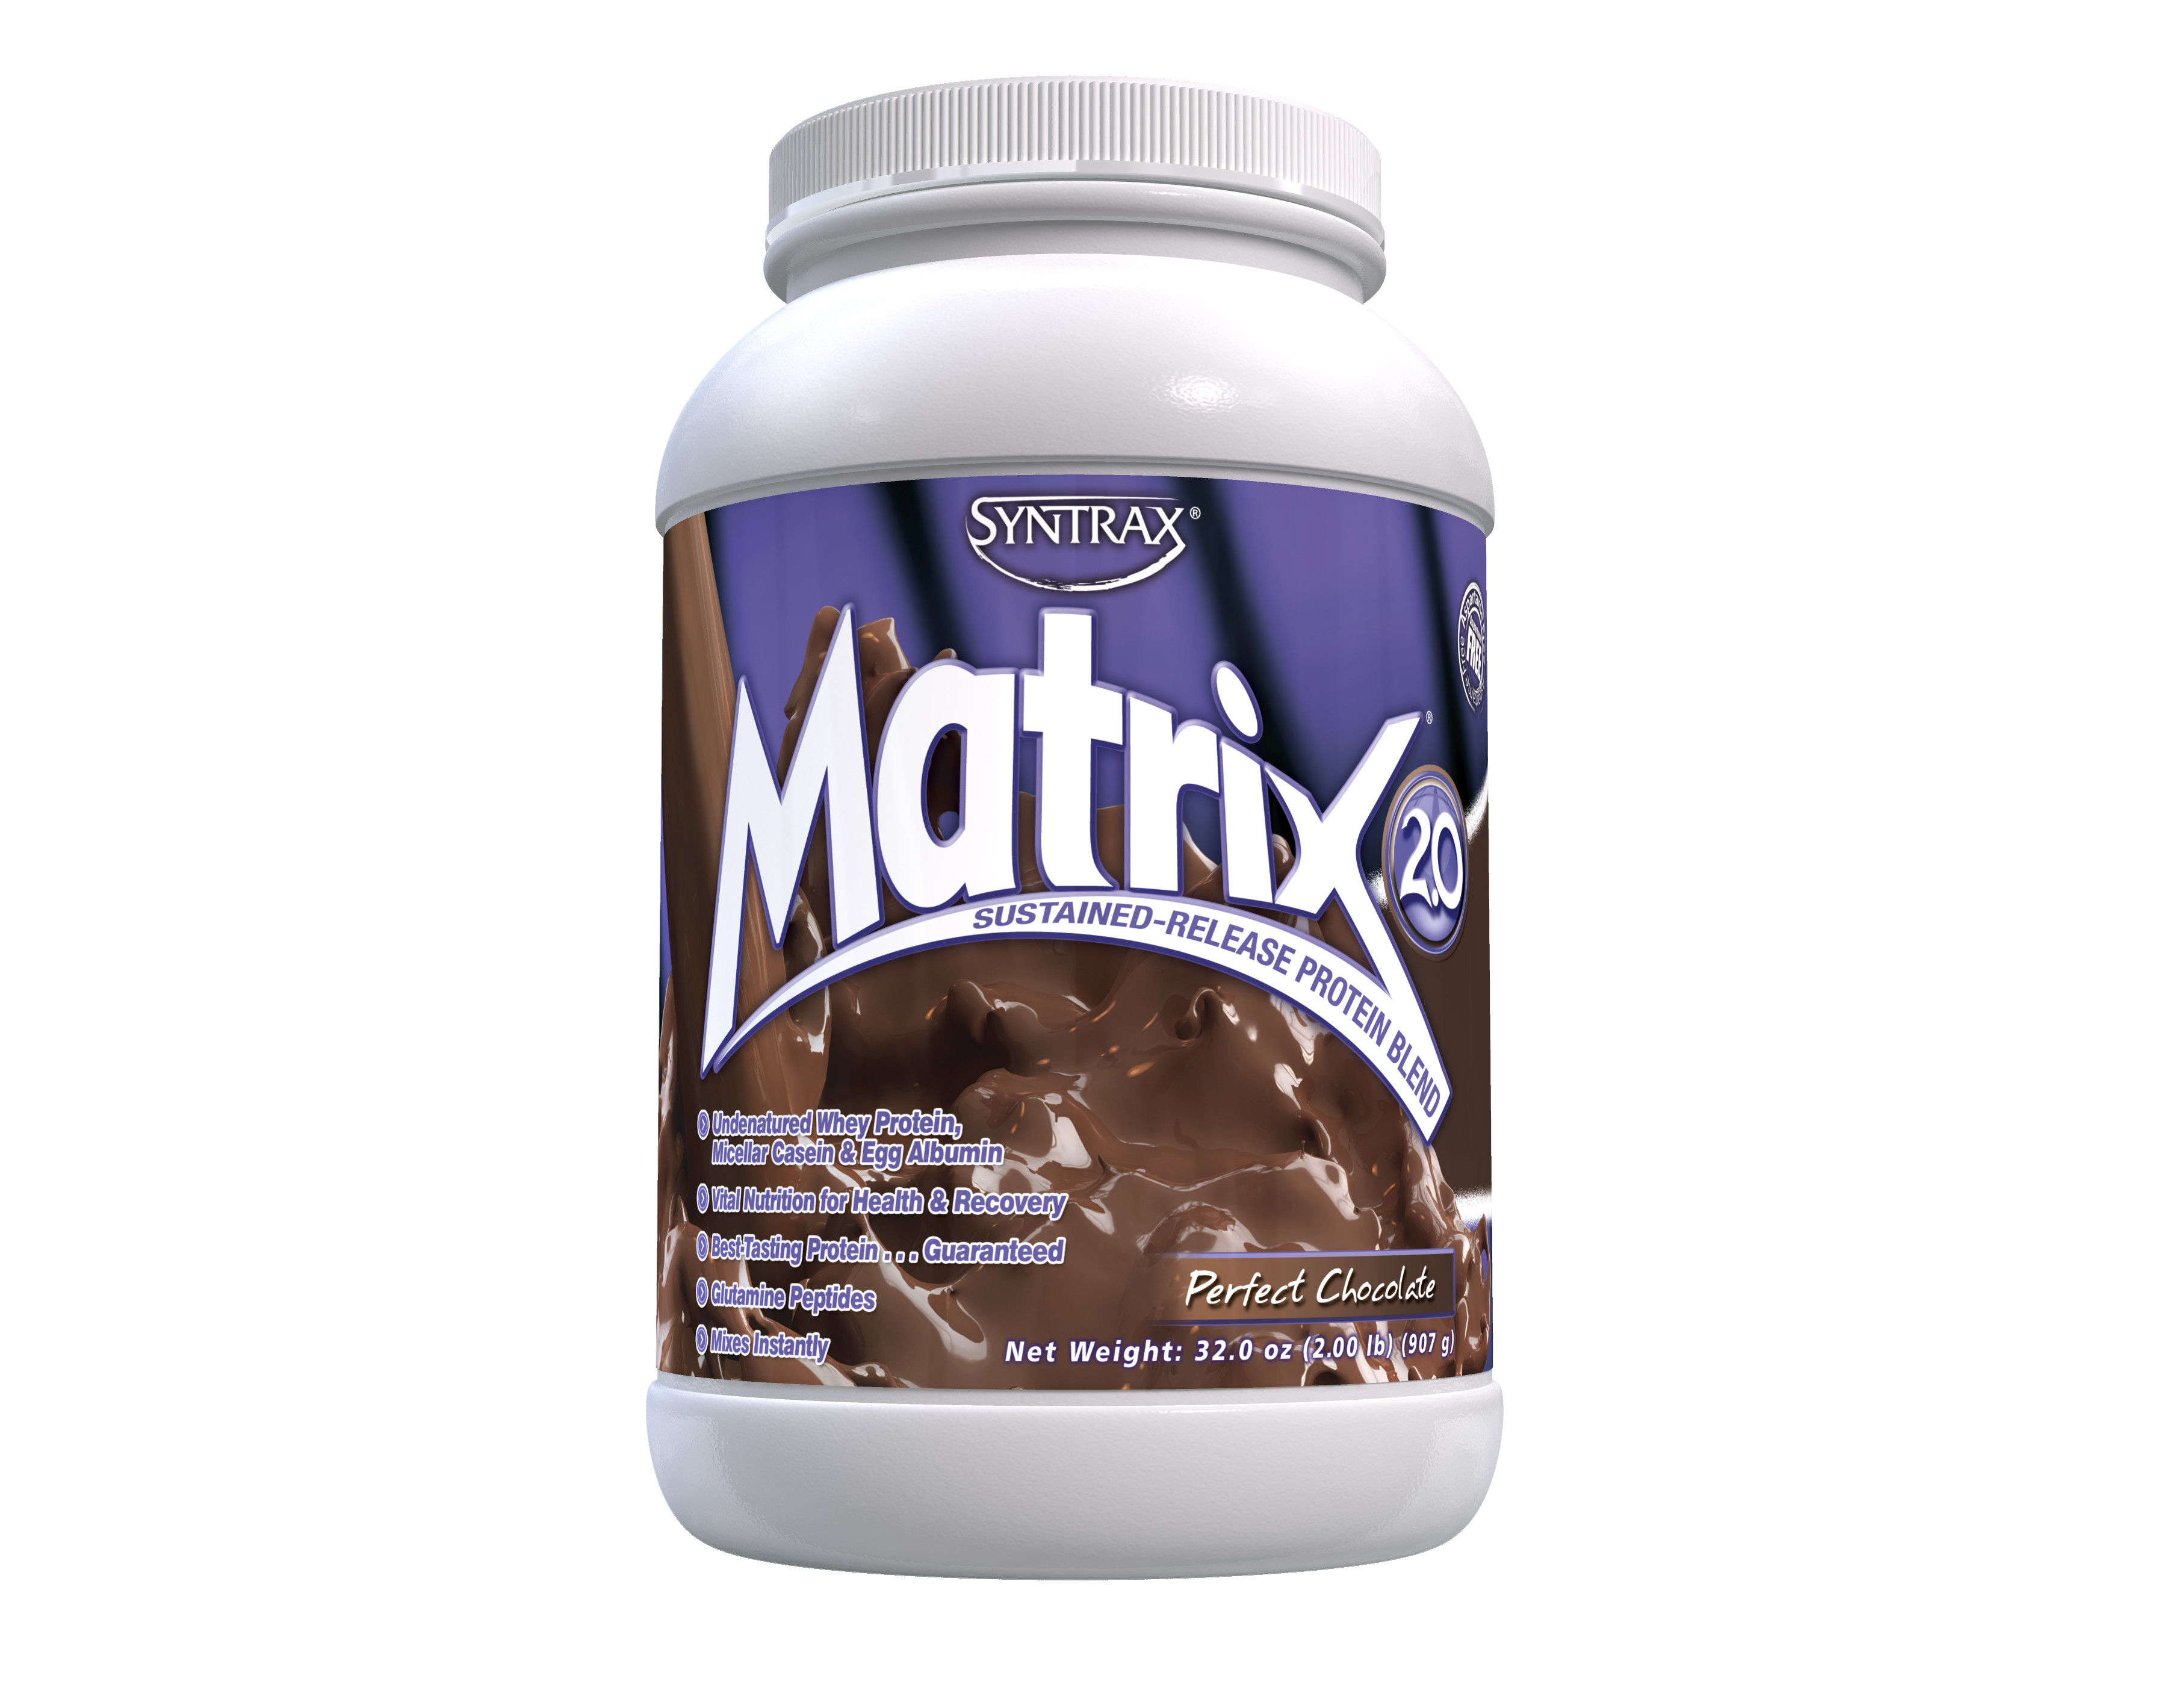 МАТРИКС 2.0 – ПЕРФЕКТЕН ШОКОЛАД прах 907г СИНТРАКС | MATRIX 2.0 – PERFECT CHOCOLATE pwd 907g SYNTRAX